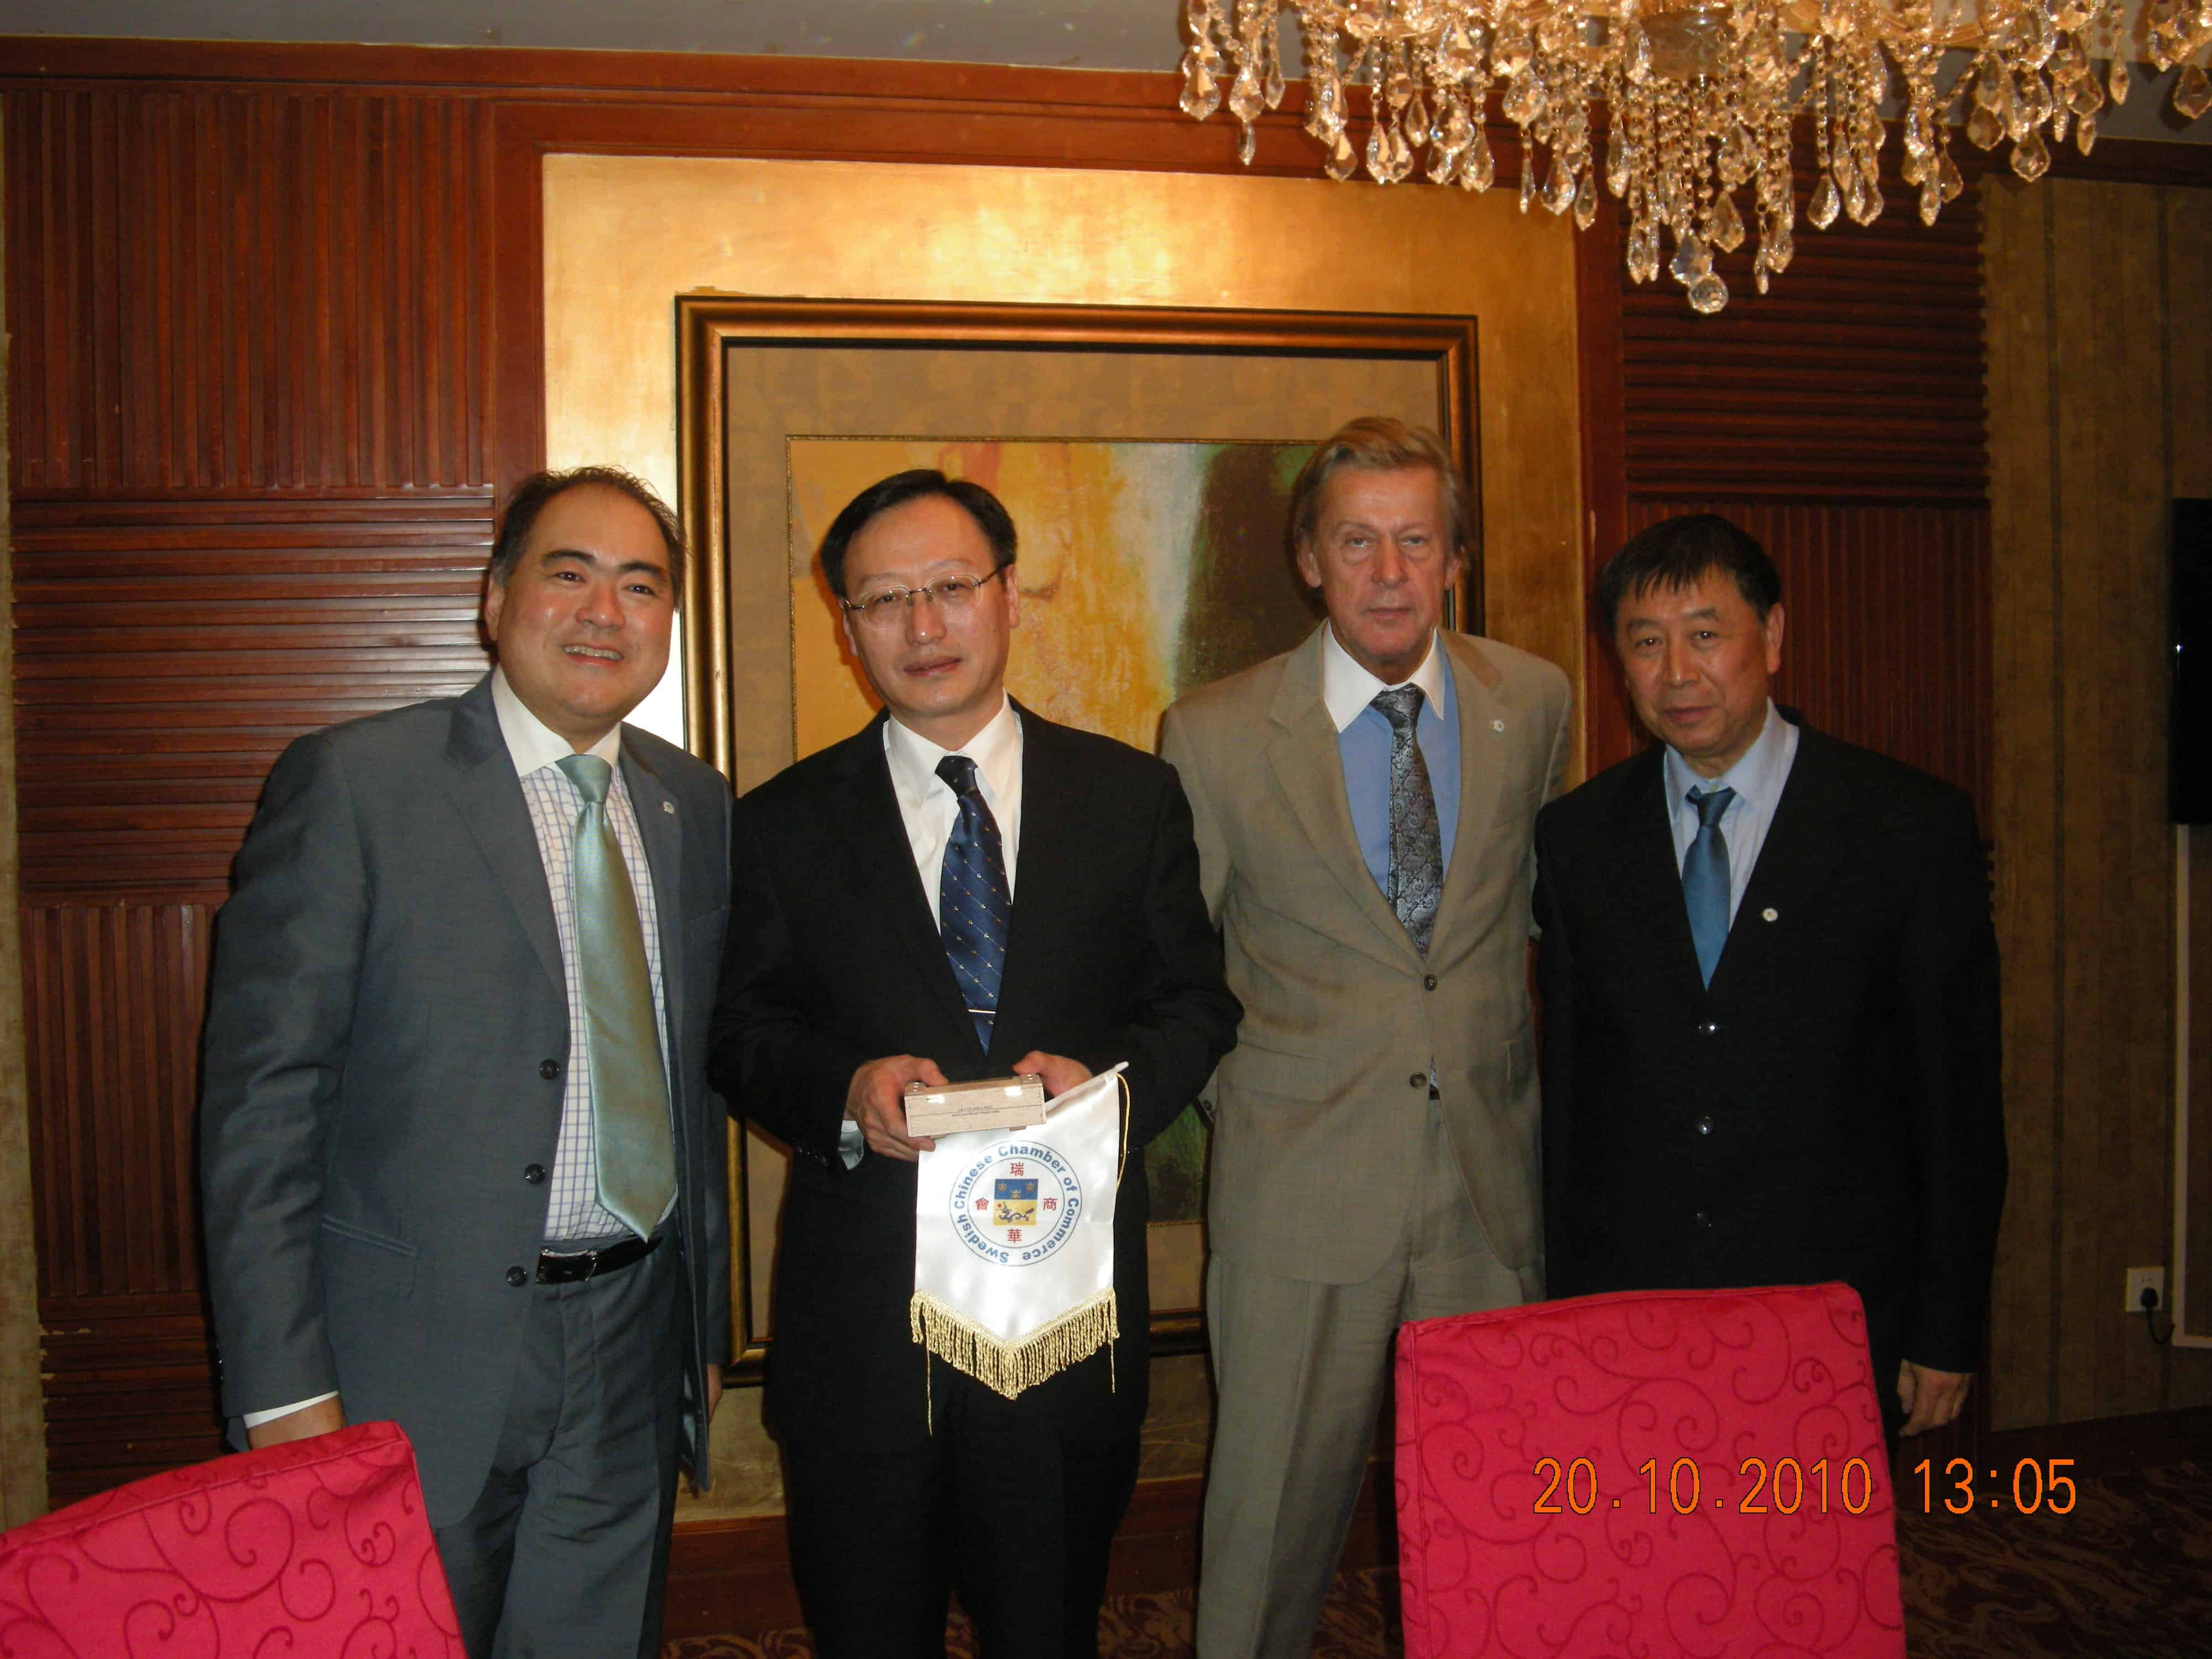 SCCC´s Kontakt resor okt 2010. besök i Tangshan Caofedian Ecocity-Shijiazhuang International Fair och Shanghai Expo